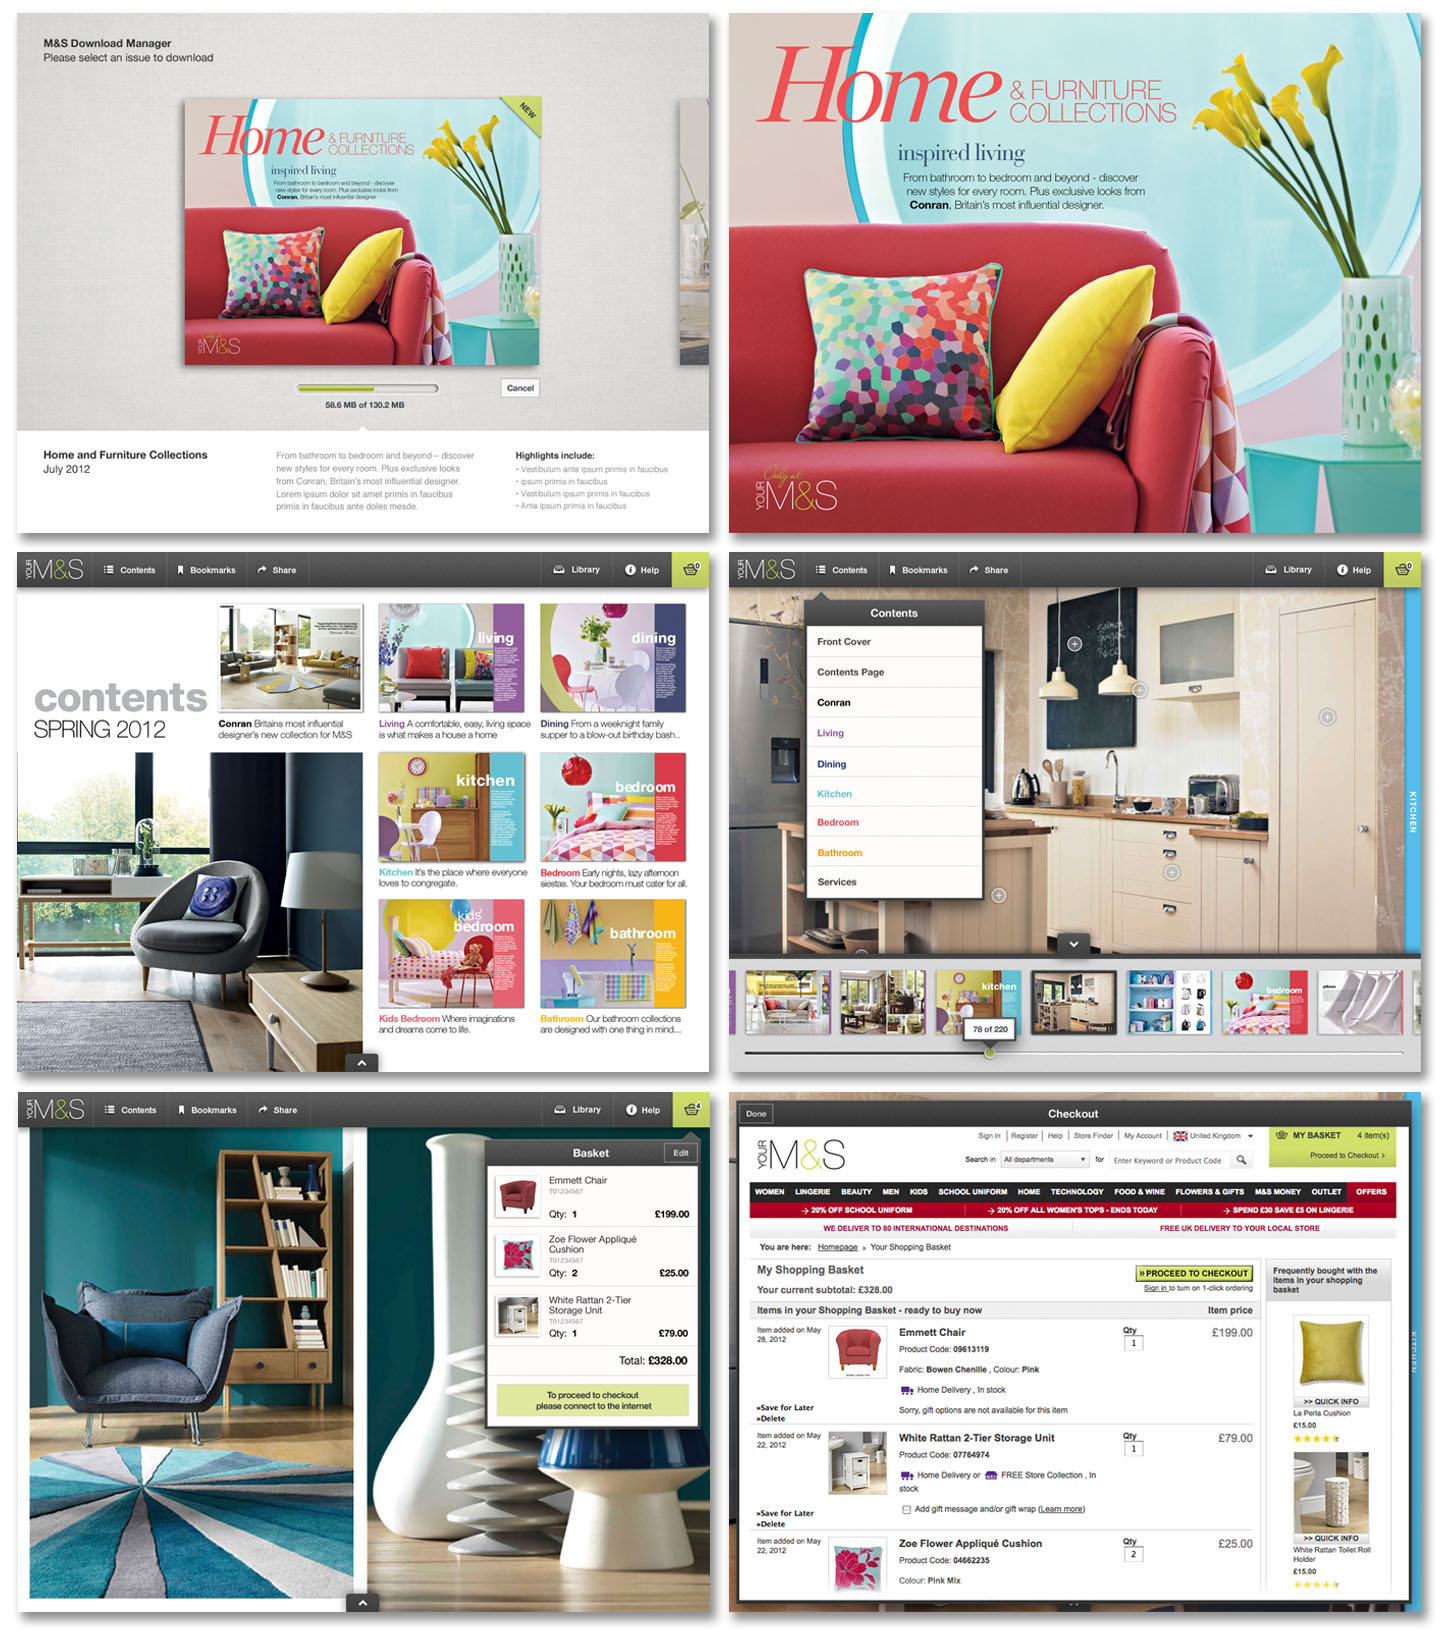 02 - M&S Home Furnishings